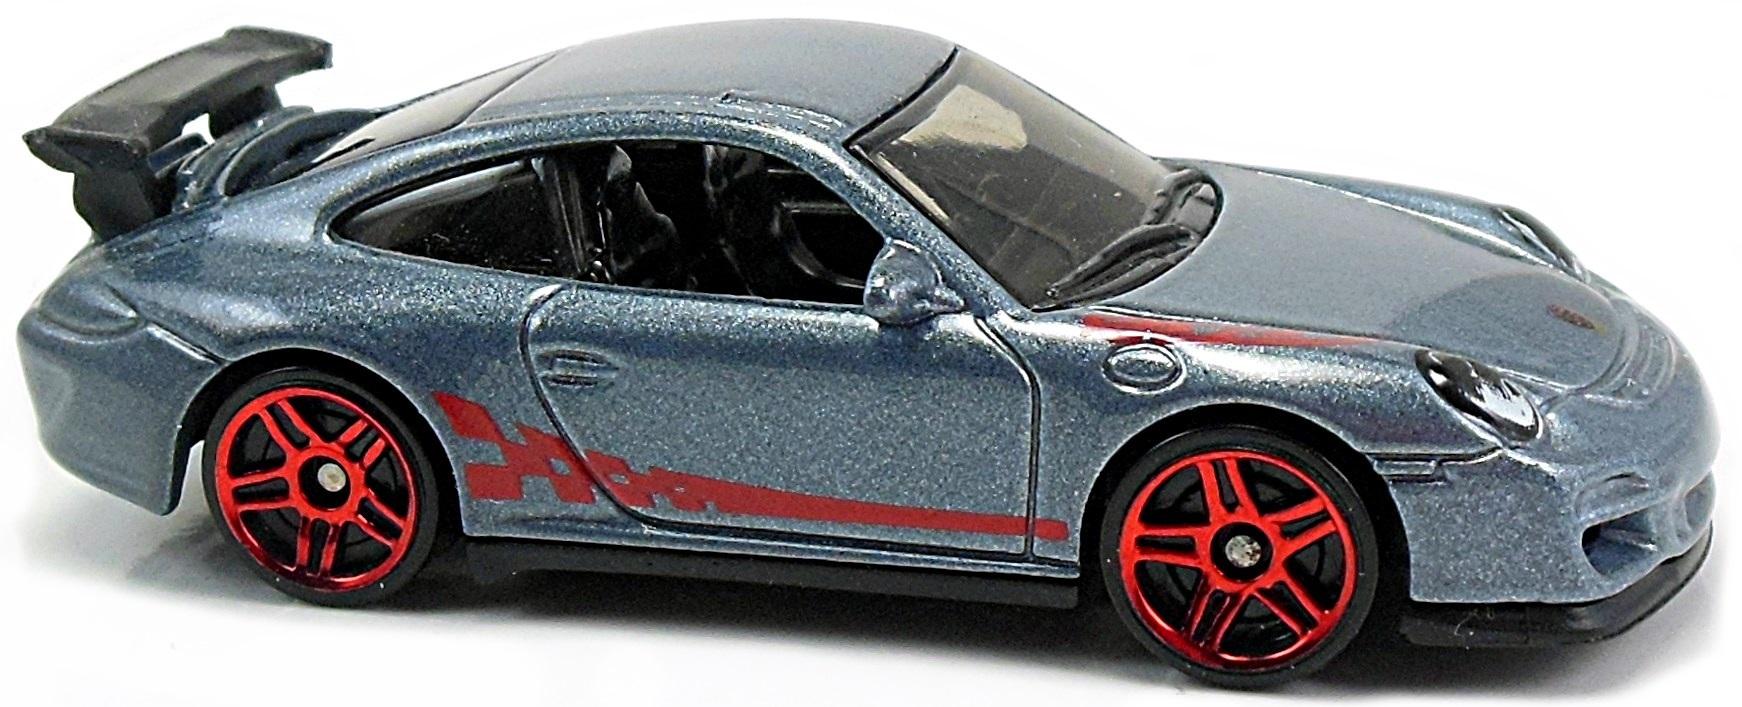 Hot Wheels Porsche 911 GT3 Cup w// red spoiler White